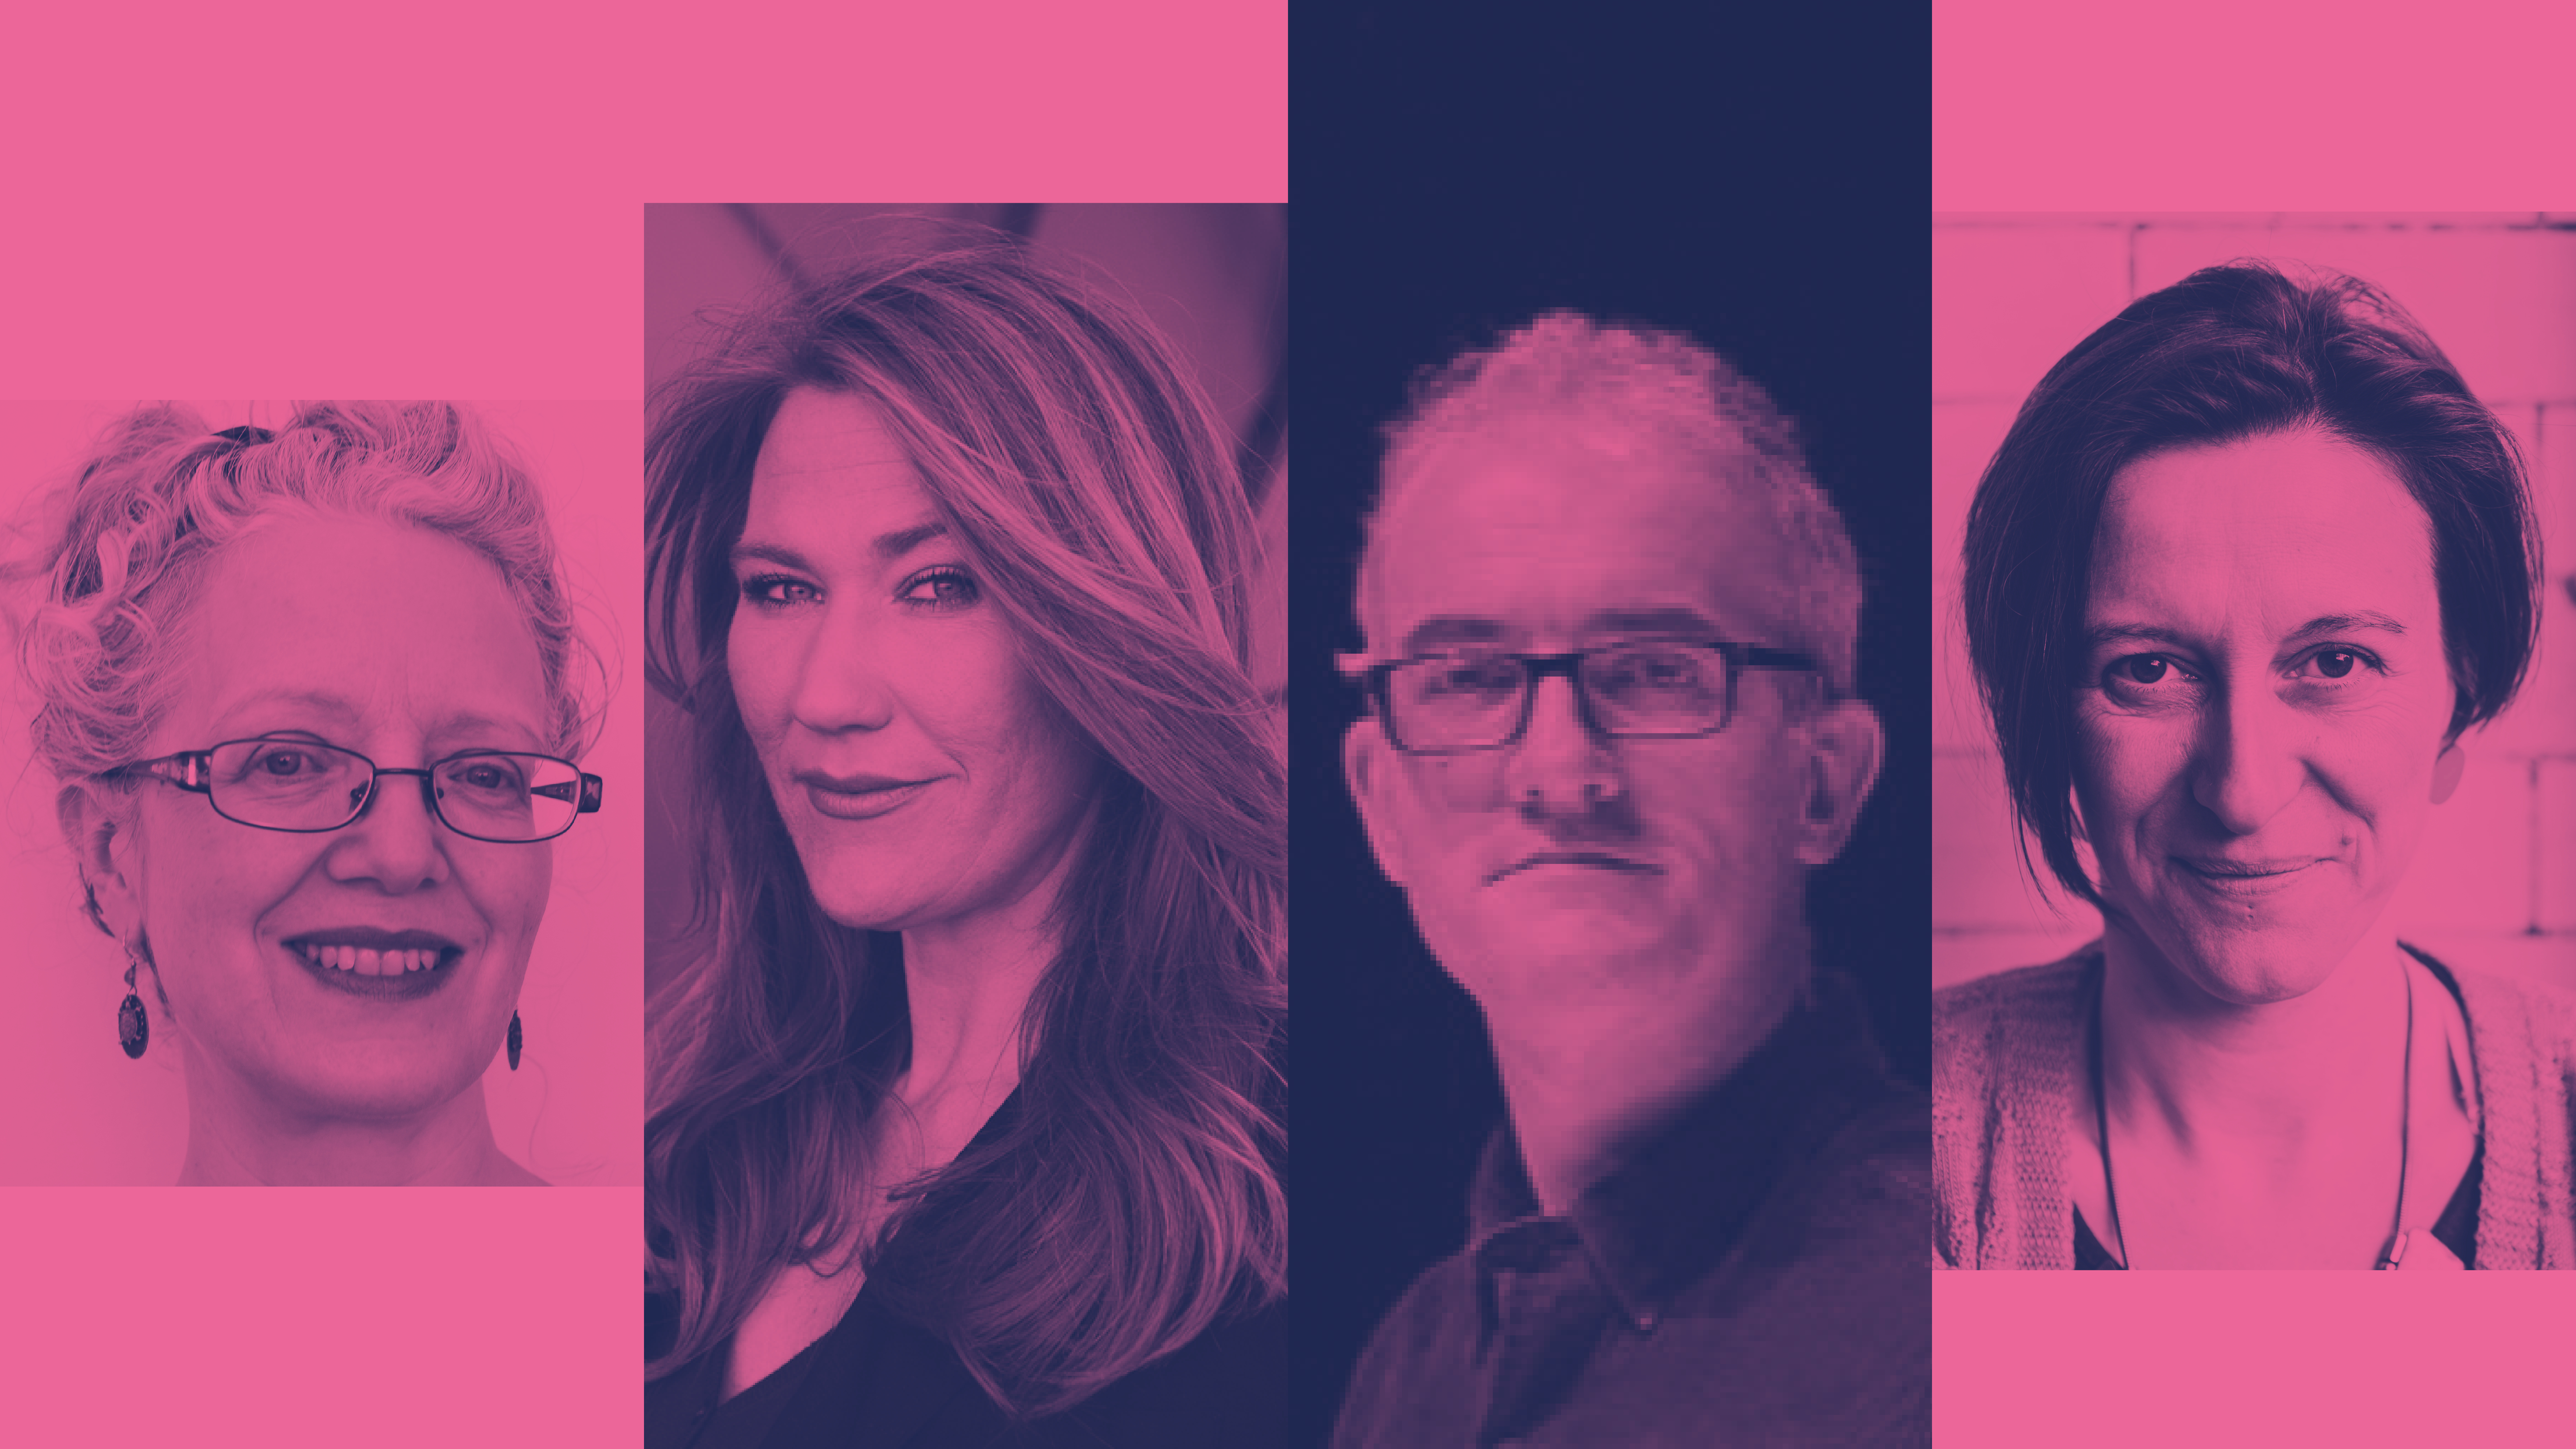 Pink duotone composite image of the panel - Evelyn Ficarra, Elizabeth Jochum, Tim Hopkins and Janine Fletcher